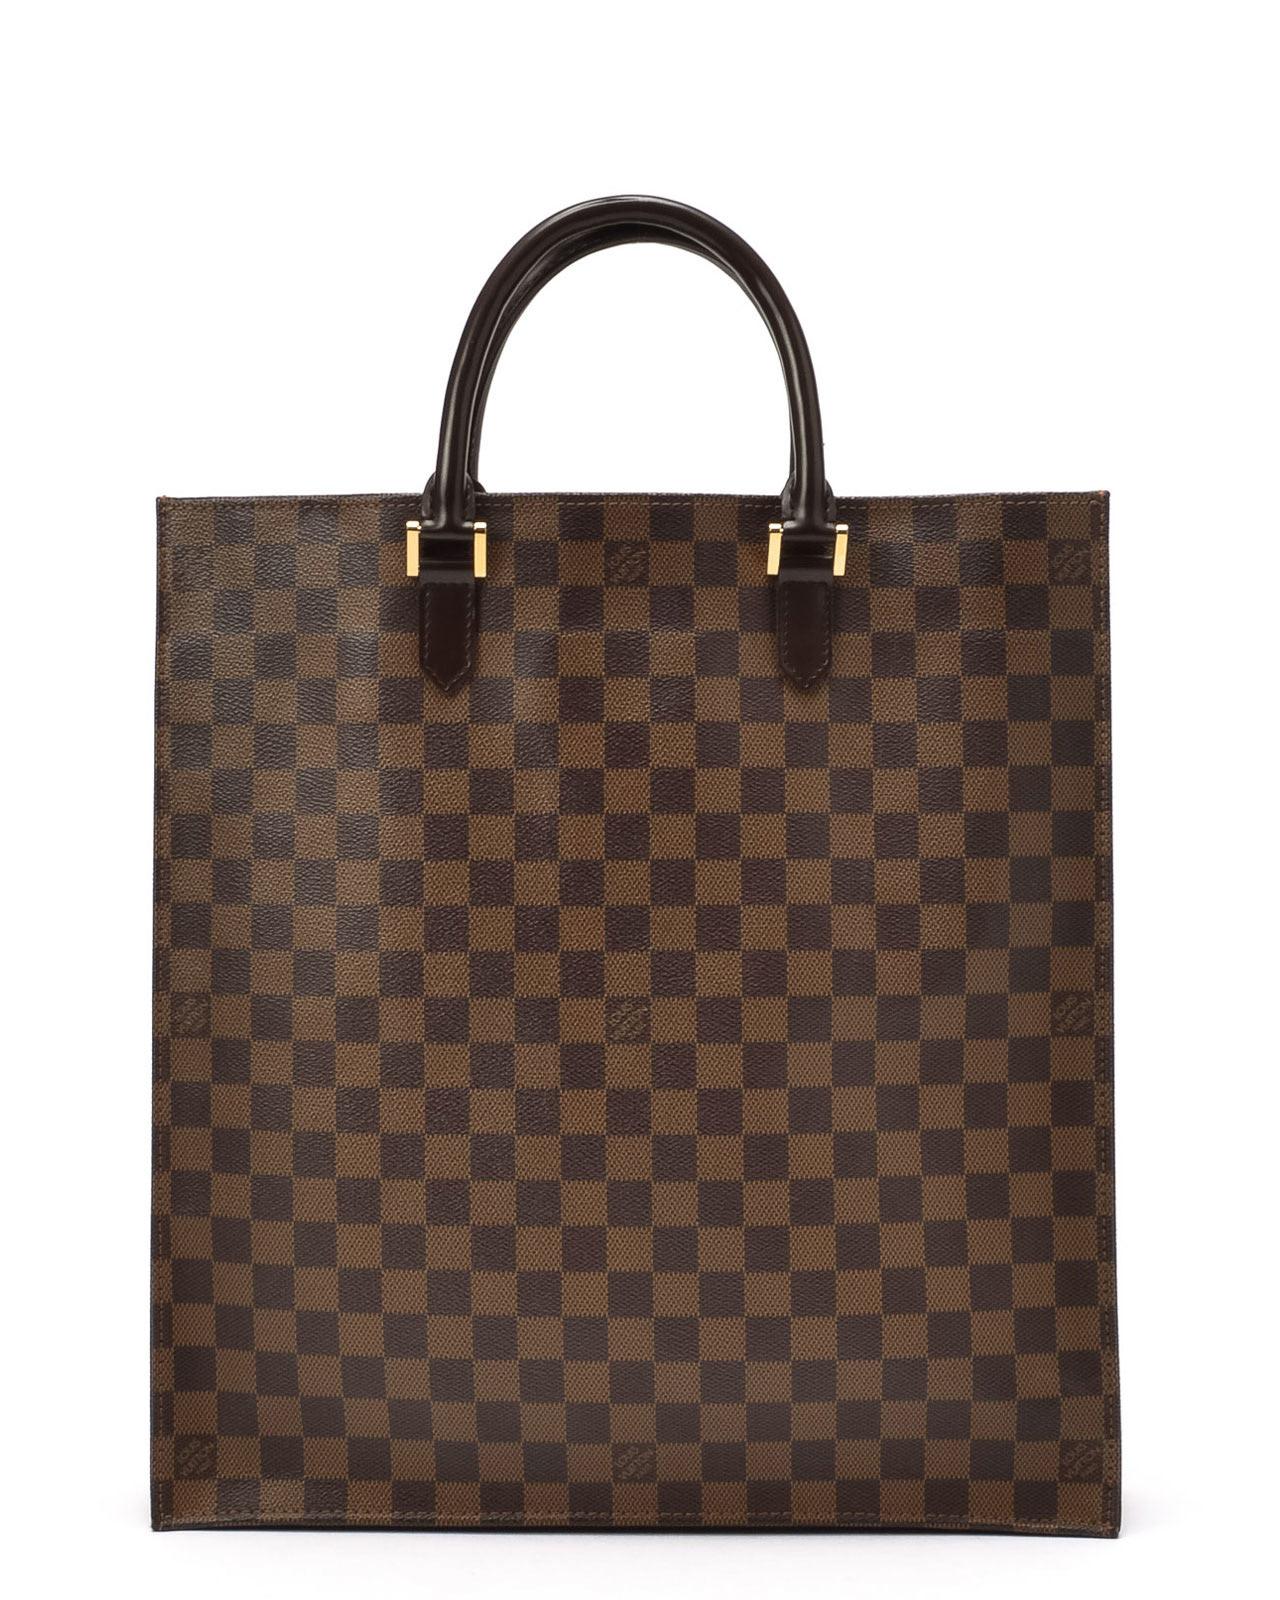 louis vuitton damier ebene sac plat handbag in green lyst. Black Bedroom Furniture Sets. Home Design Ideas